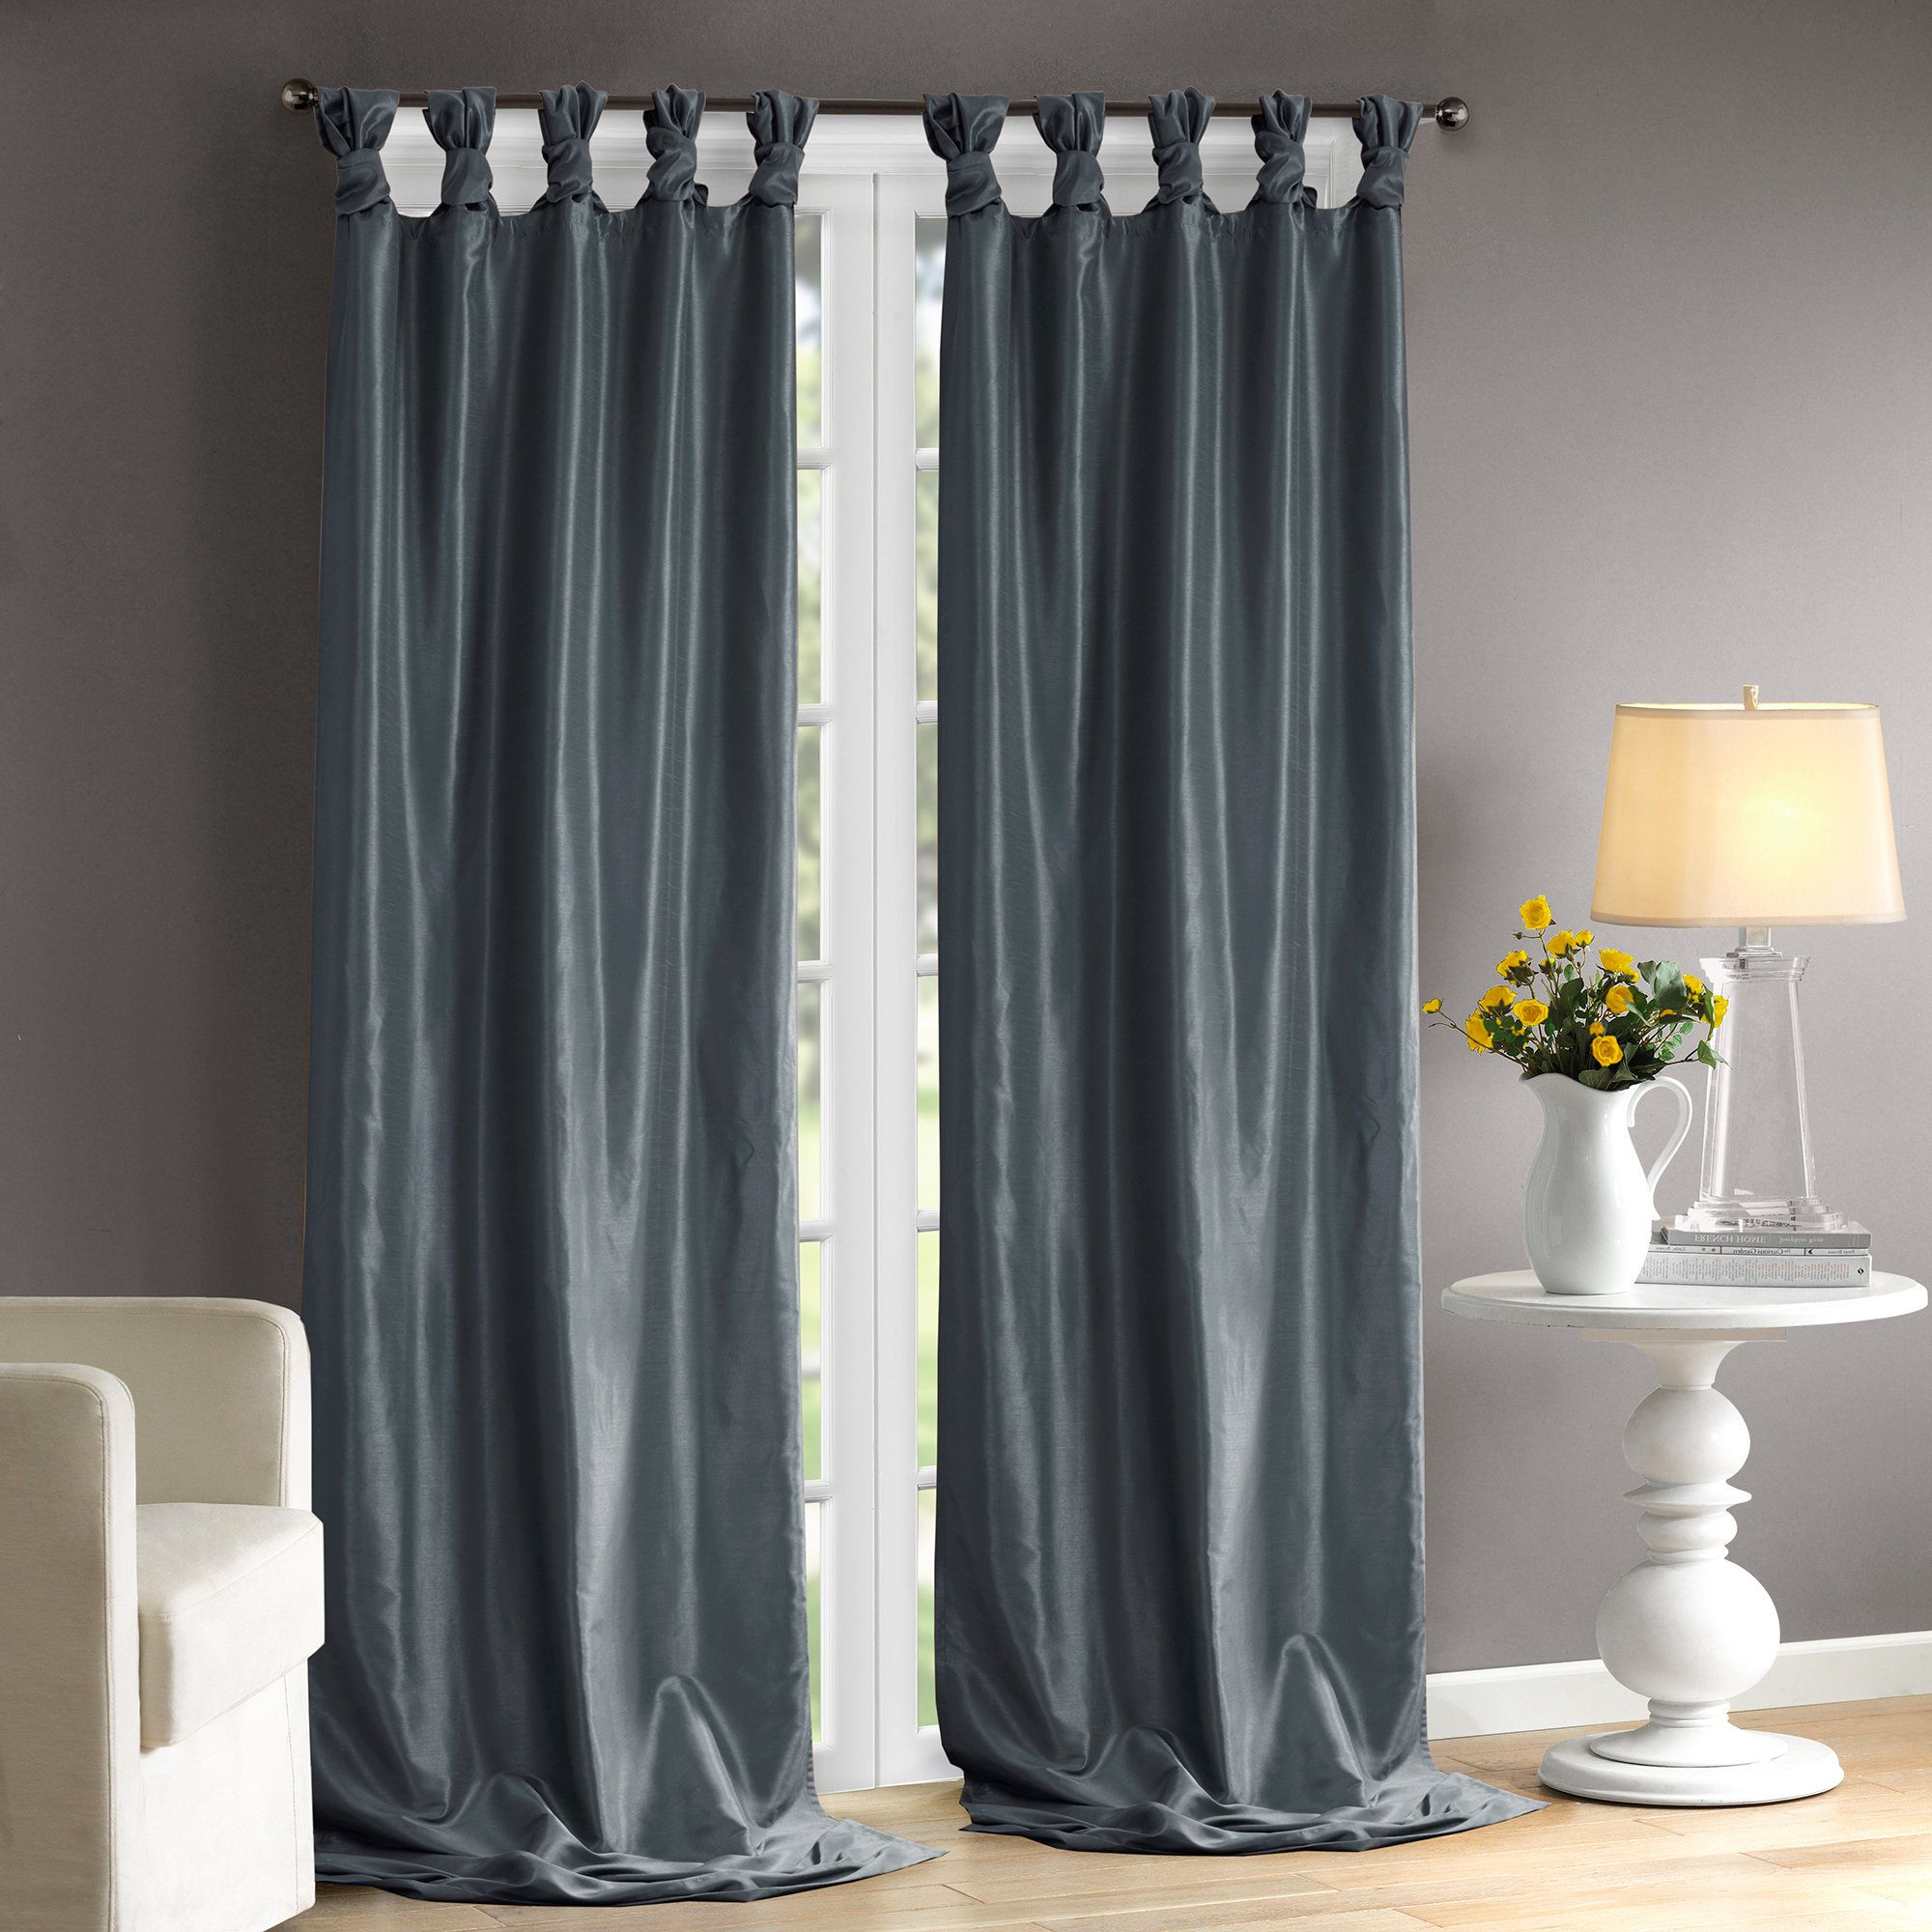 Rivau Solid Regular Tab Top Curtain Panels (Gallery 1 of 20)